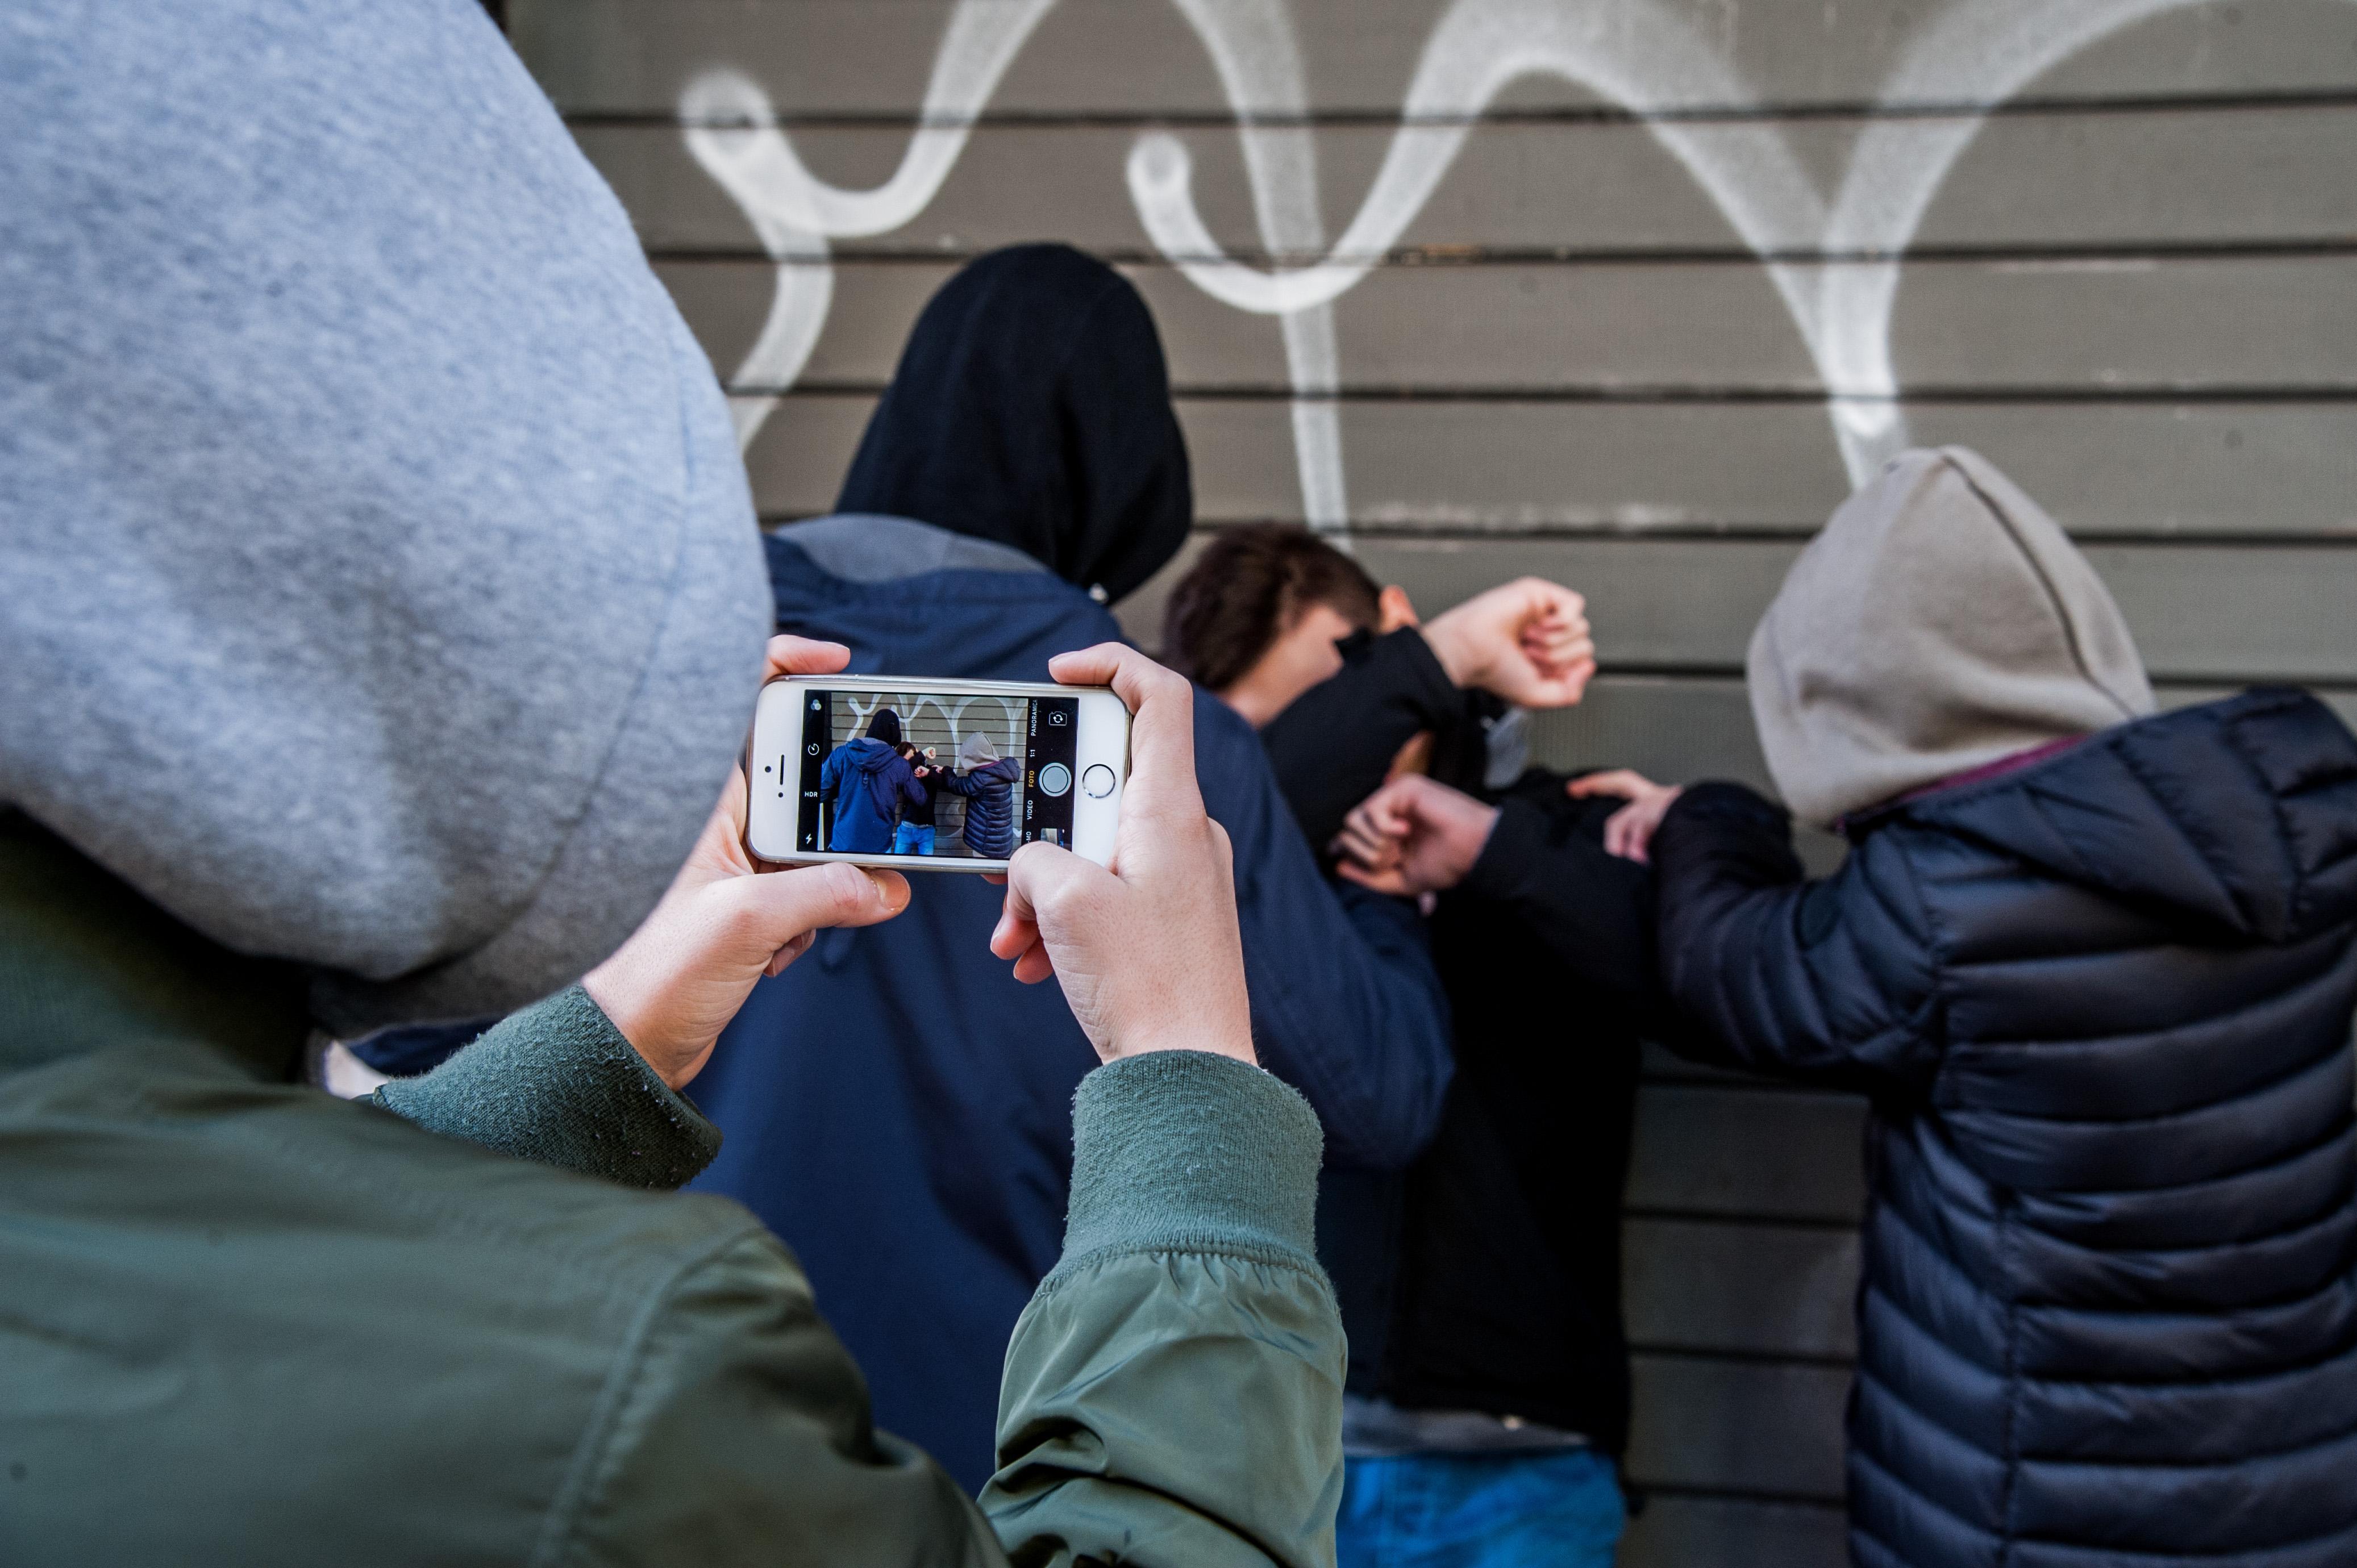 A group of boys bullies a peer in Rome